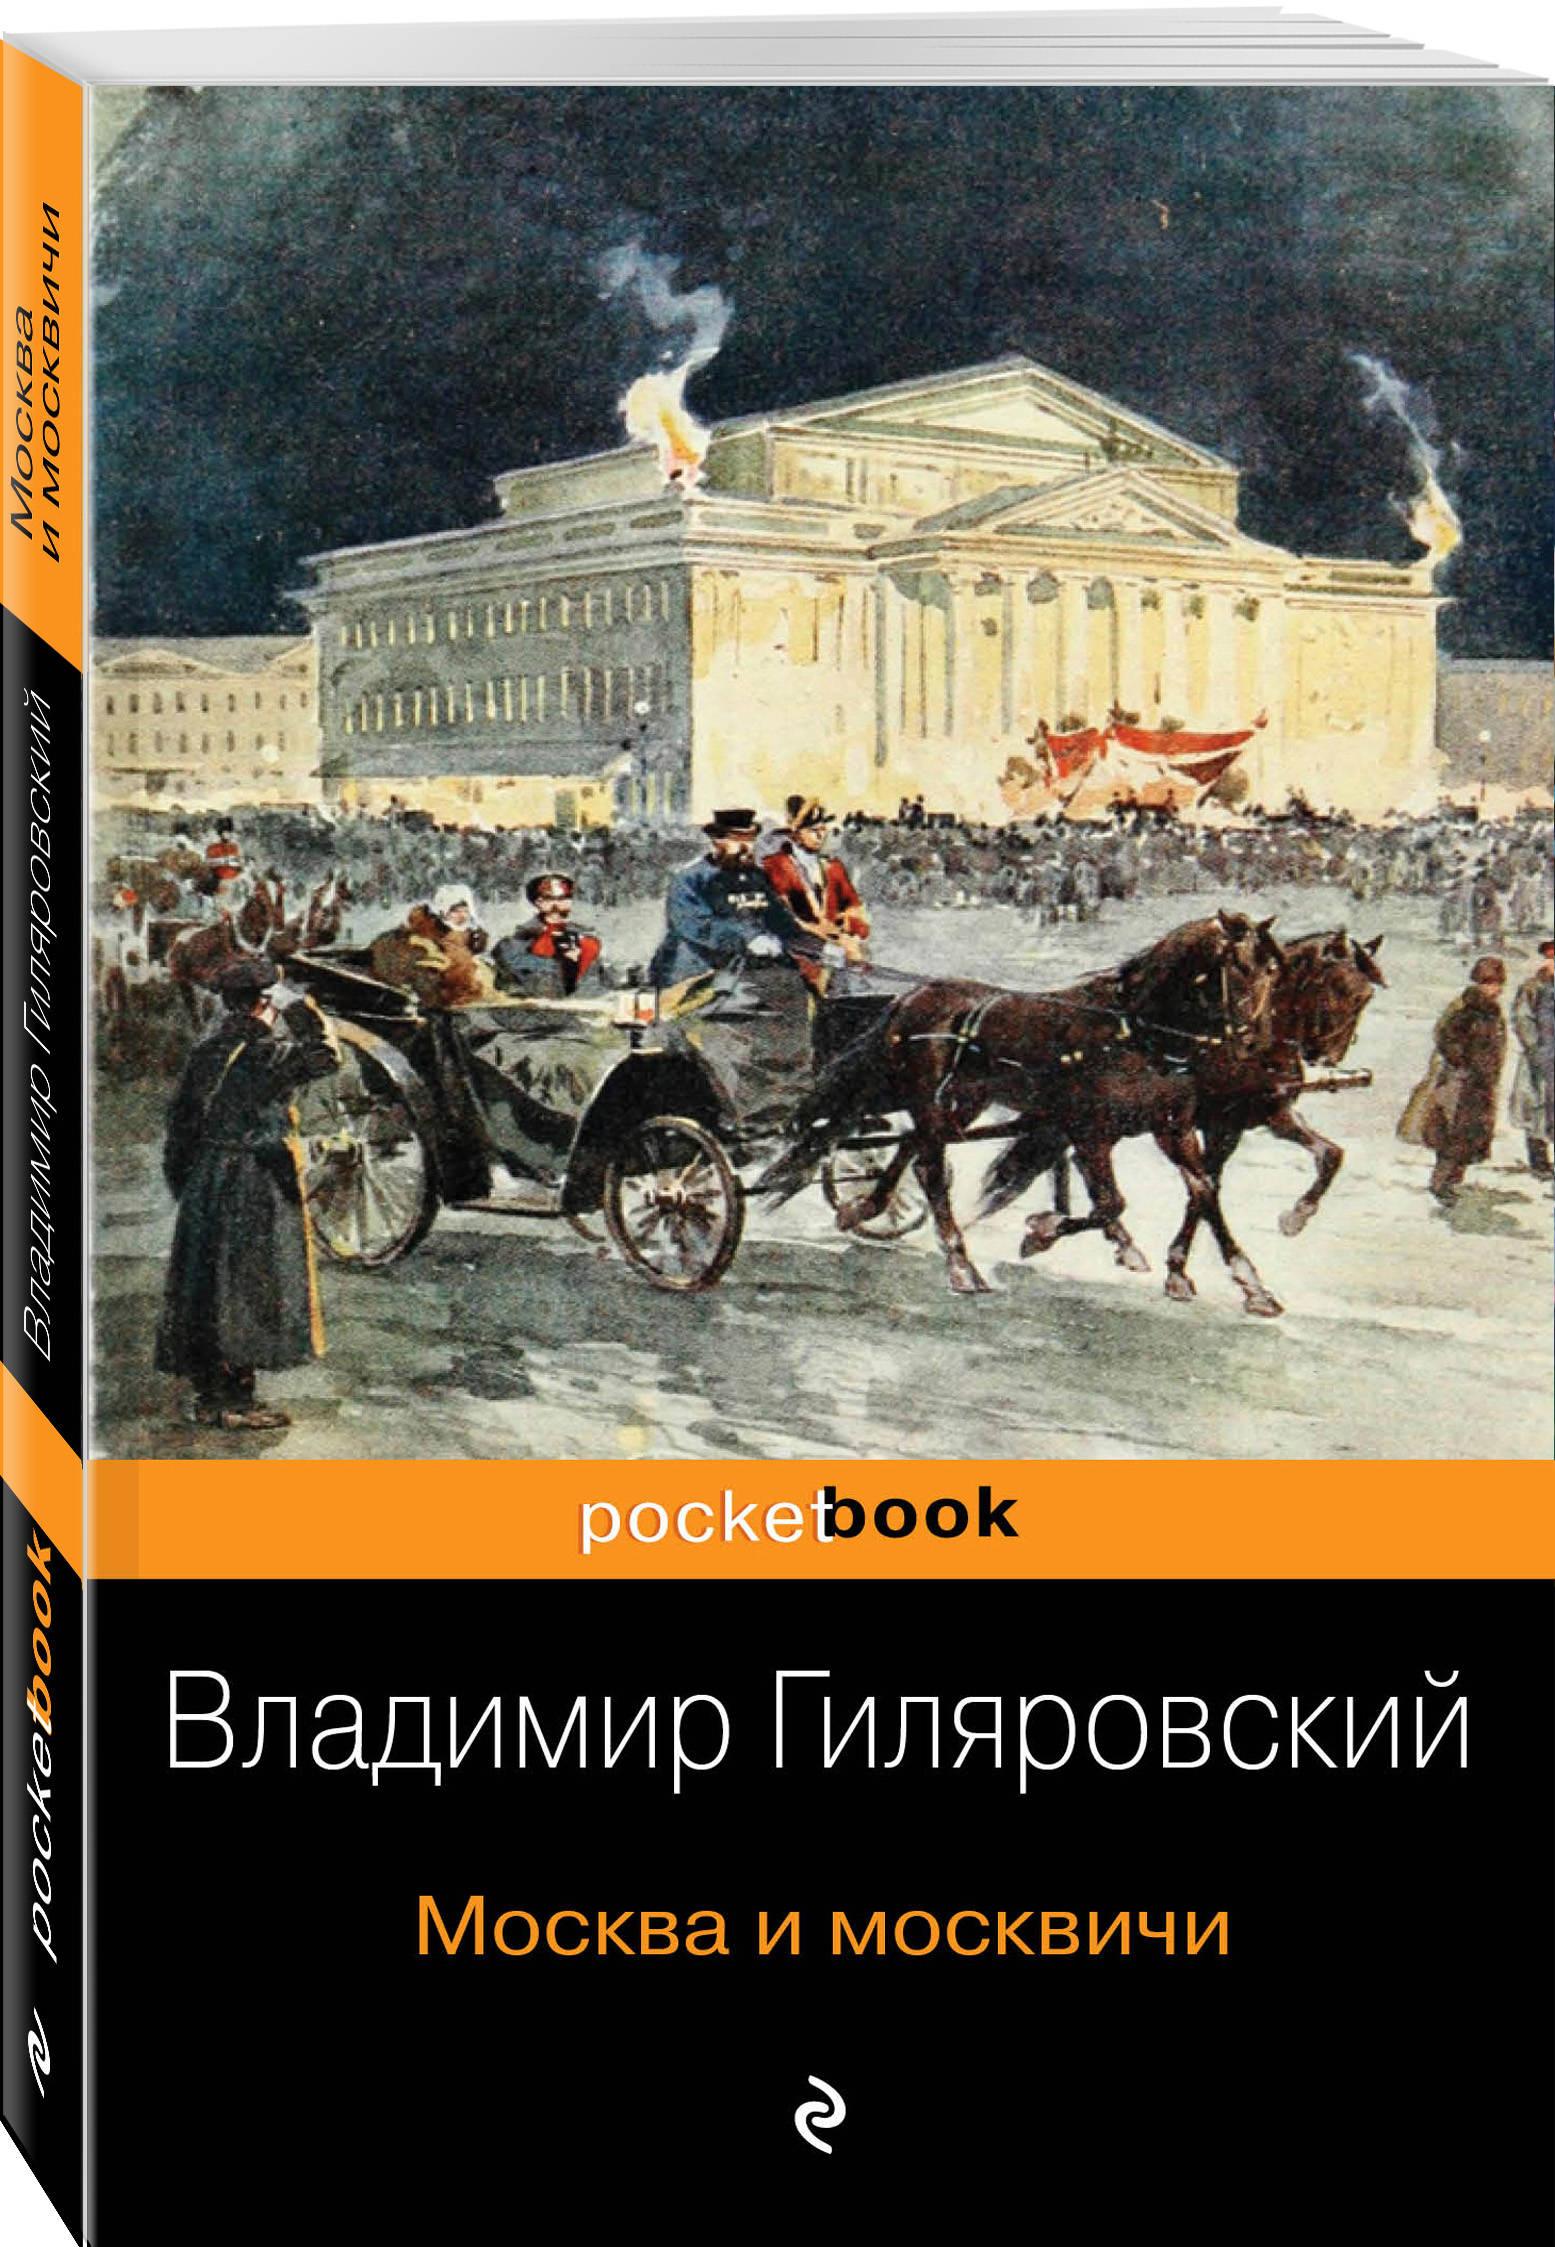 Гиляровский Владимир Алексеевич Москва и москвичи